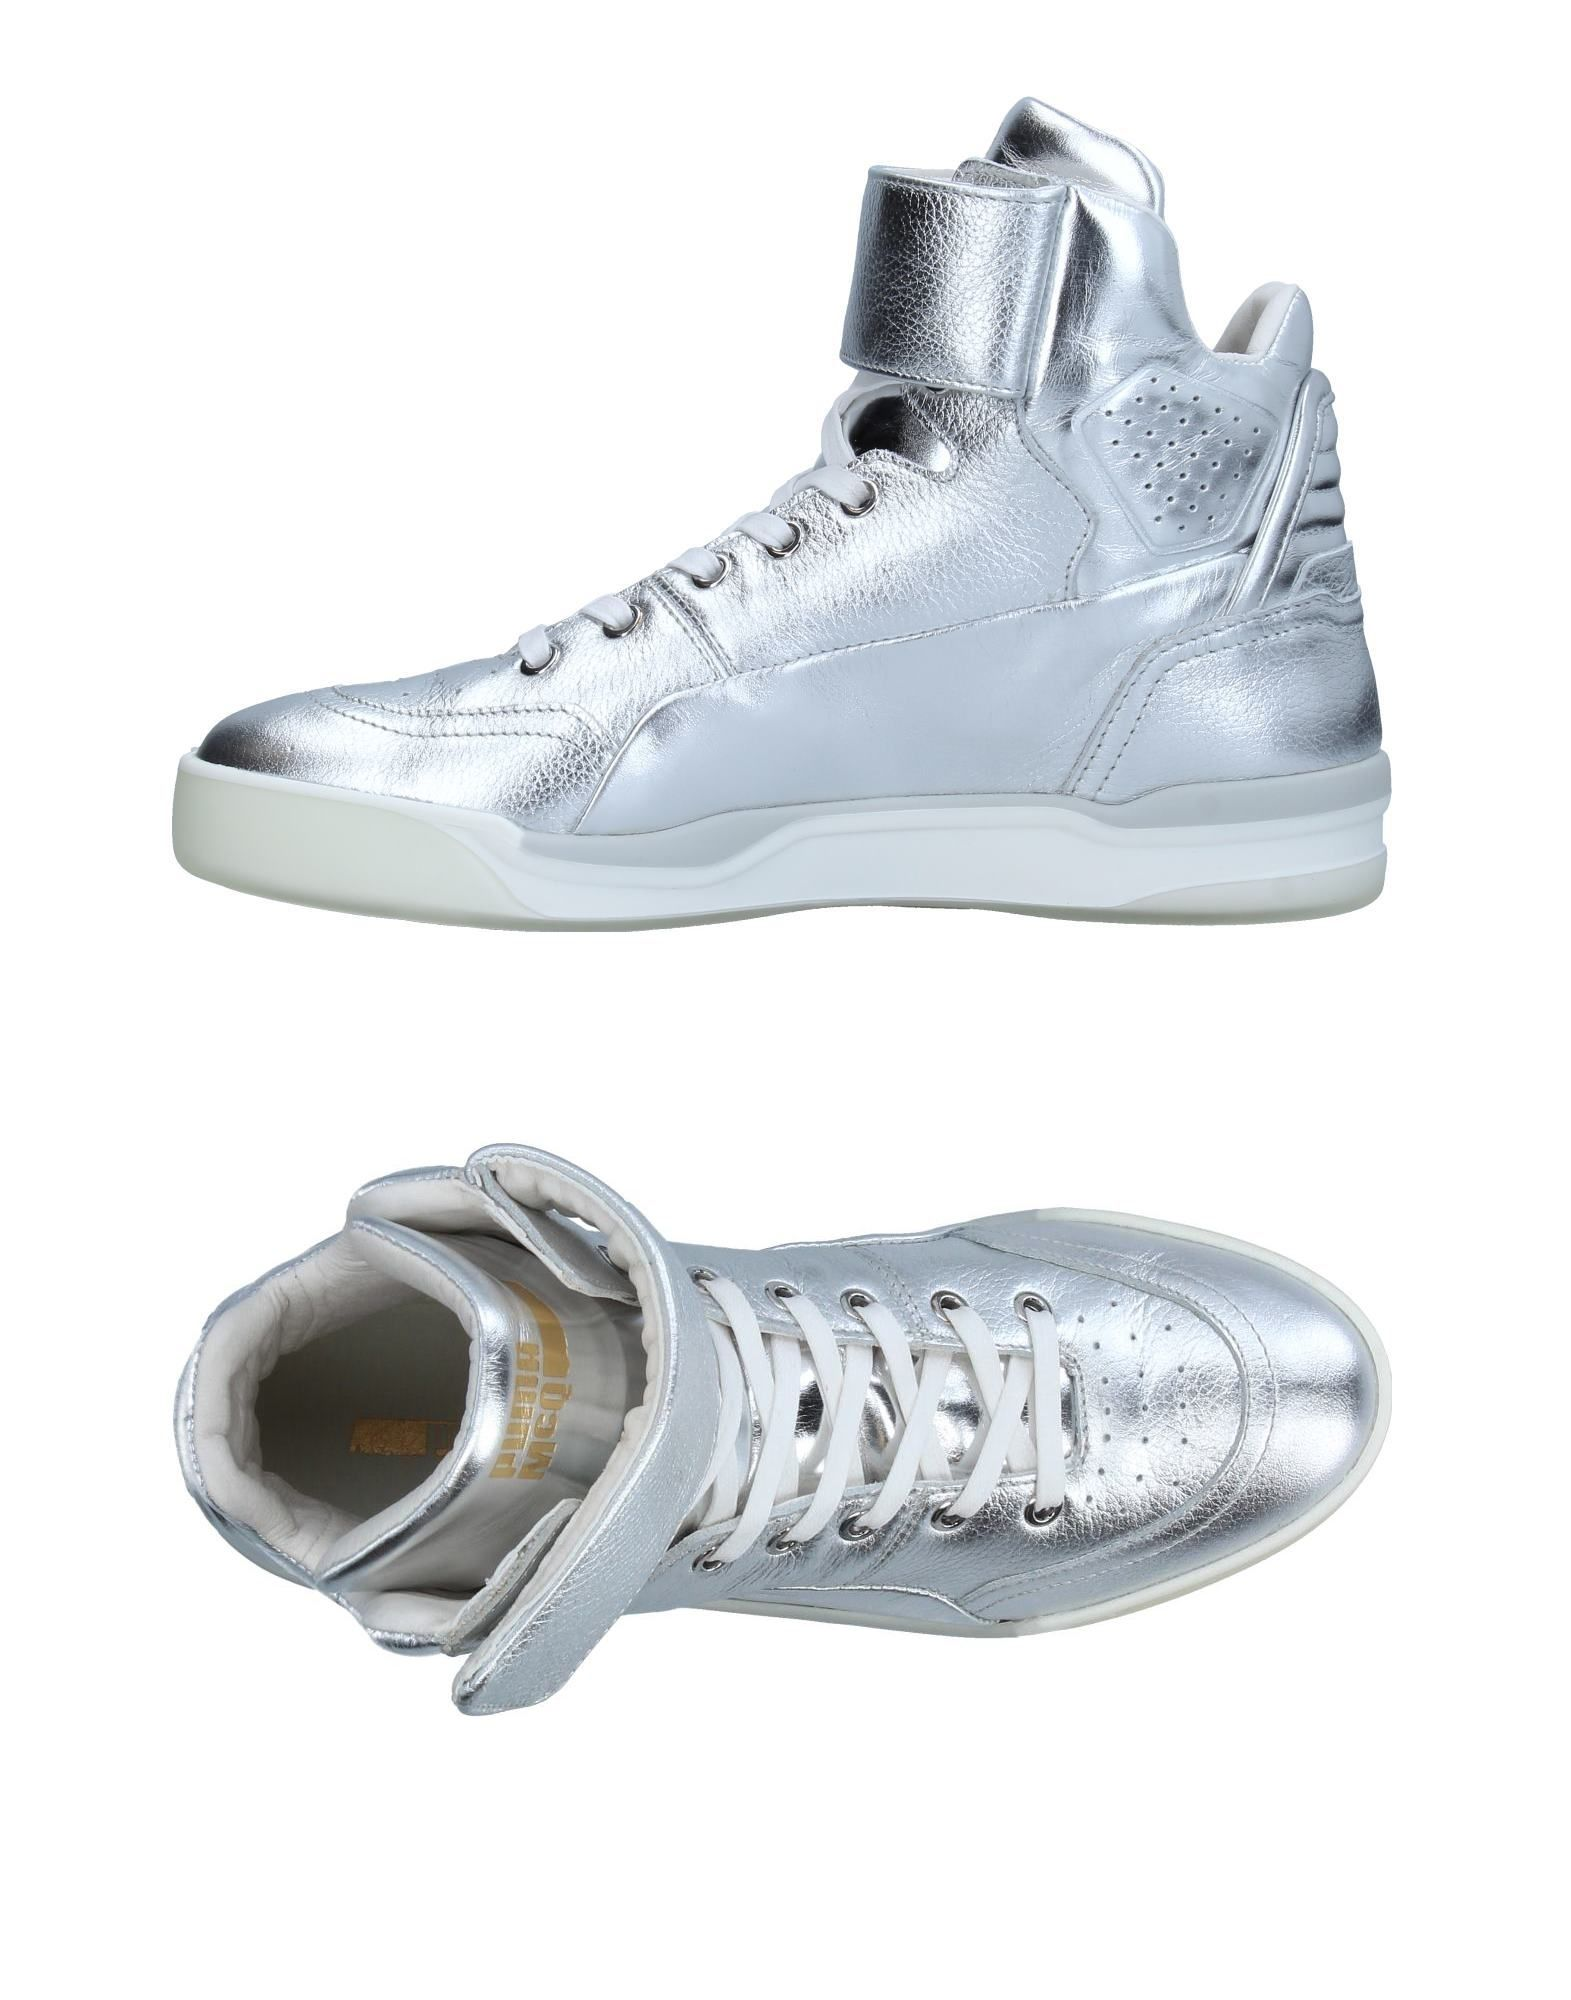 Mcq Puma Sneakers Herren  11333756EK Gute Qualität beliebte Schuhe